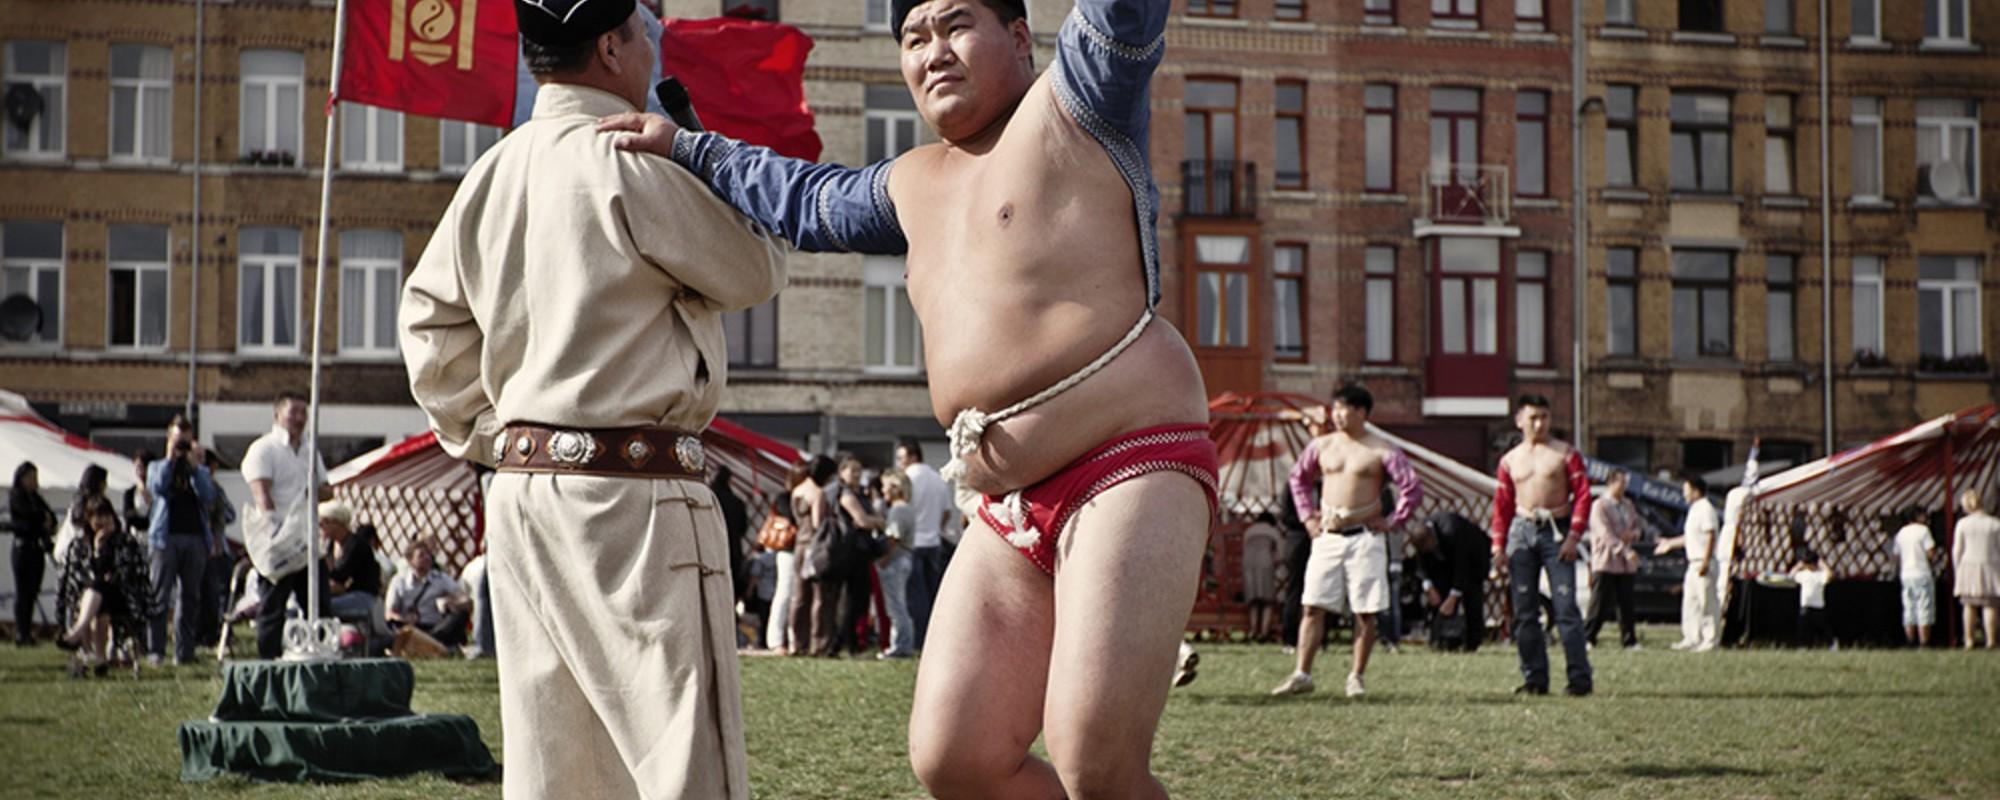 Bökh: La lucha tradicional de Mongolia